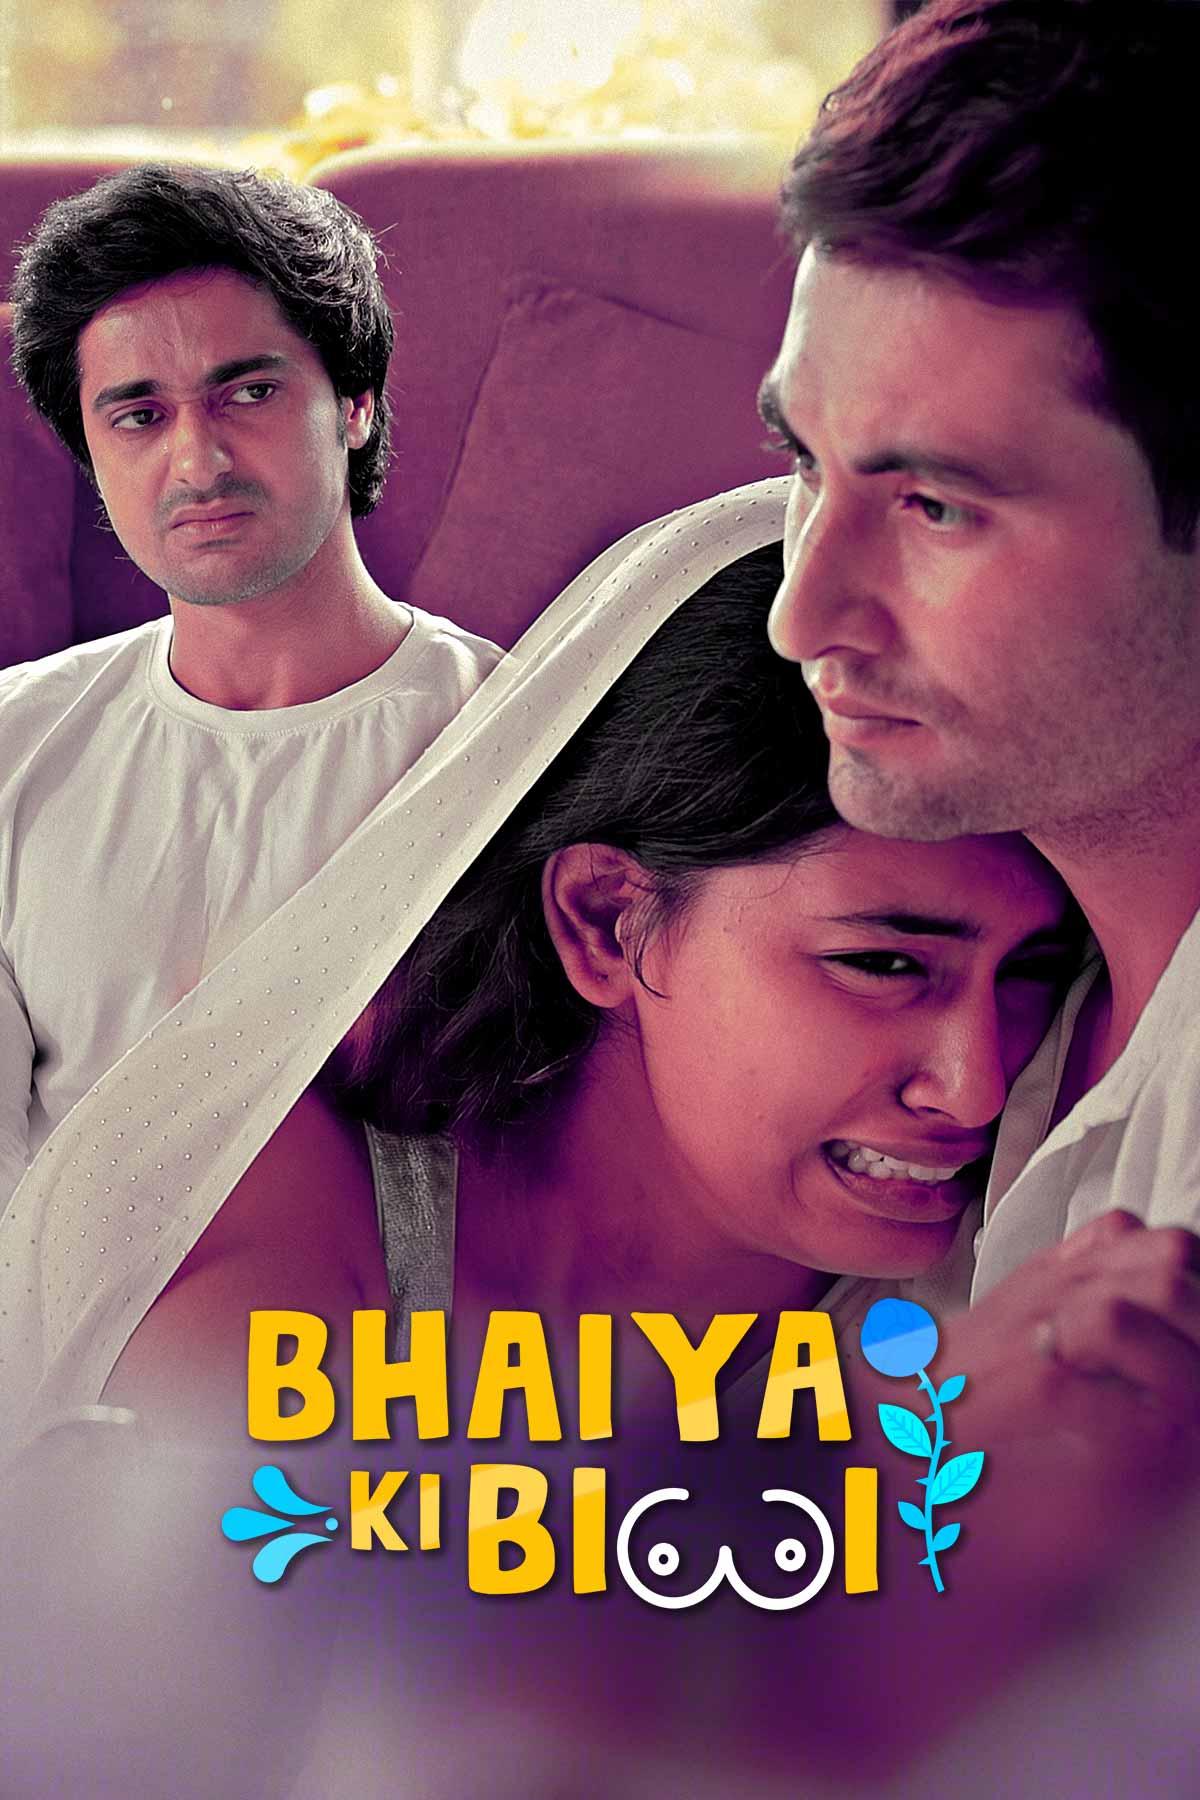 18+ Bhaiya Ki Biwi Kooku Series Erotic Hd Adult Web Series Hindi